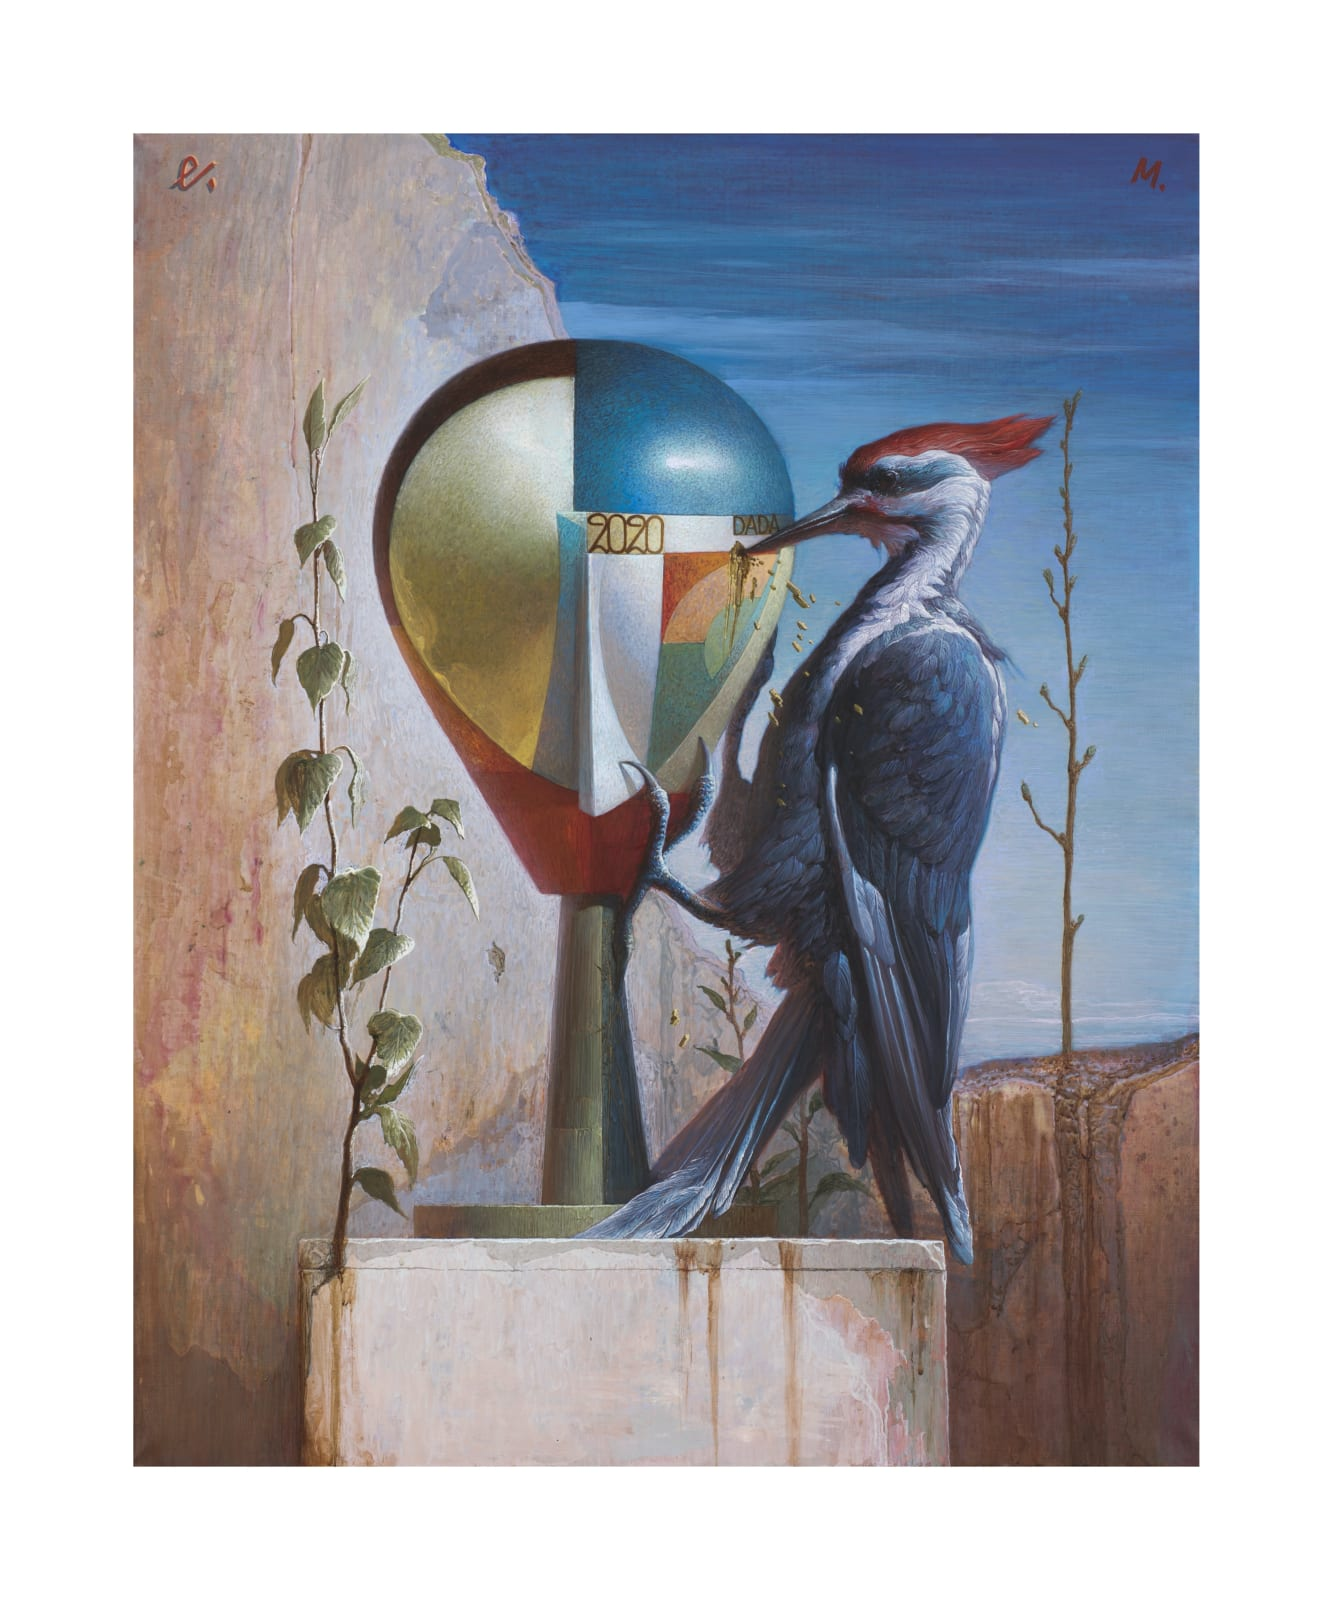 Егор Кошелев | Egor Koshelev Дадаистская голова | Dada Head, 2020 Холст, масло | oil on canvas 100 х 80 см